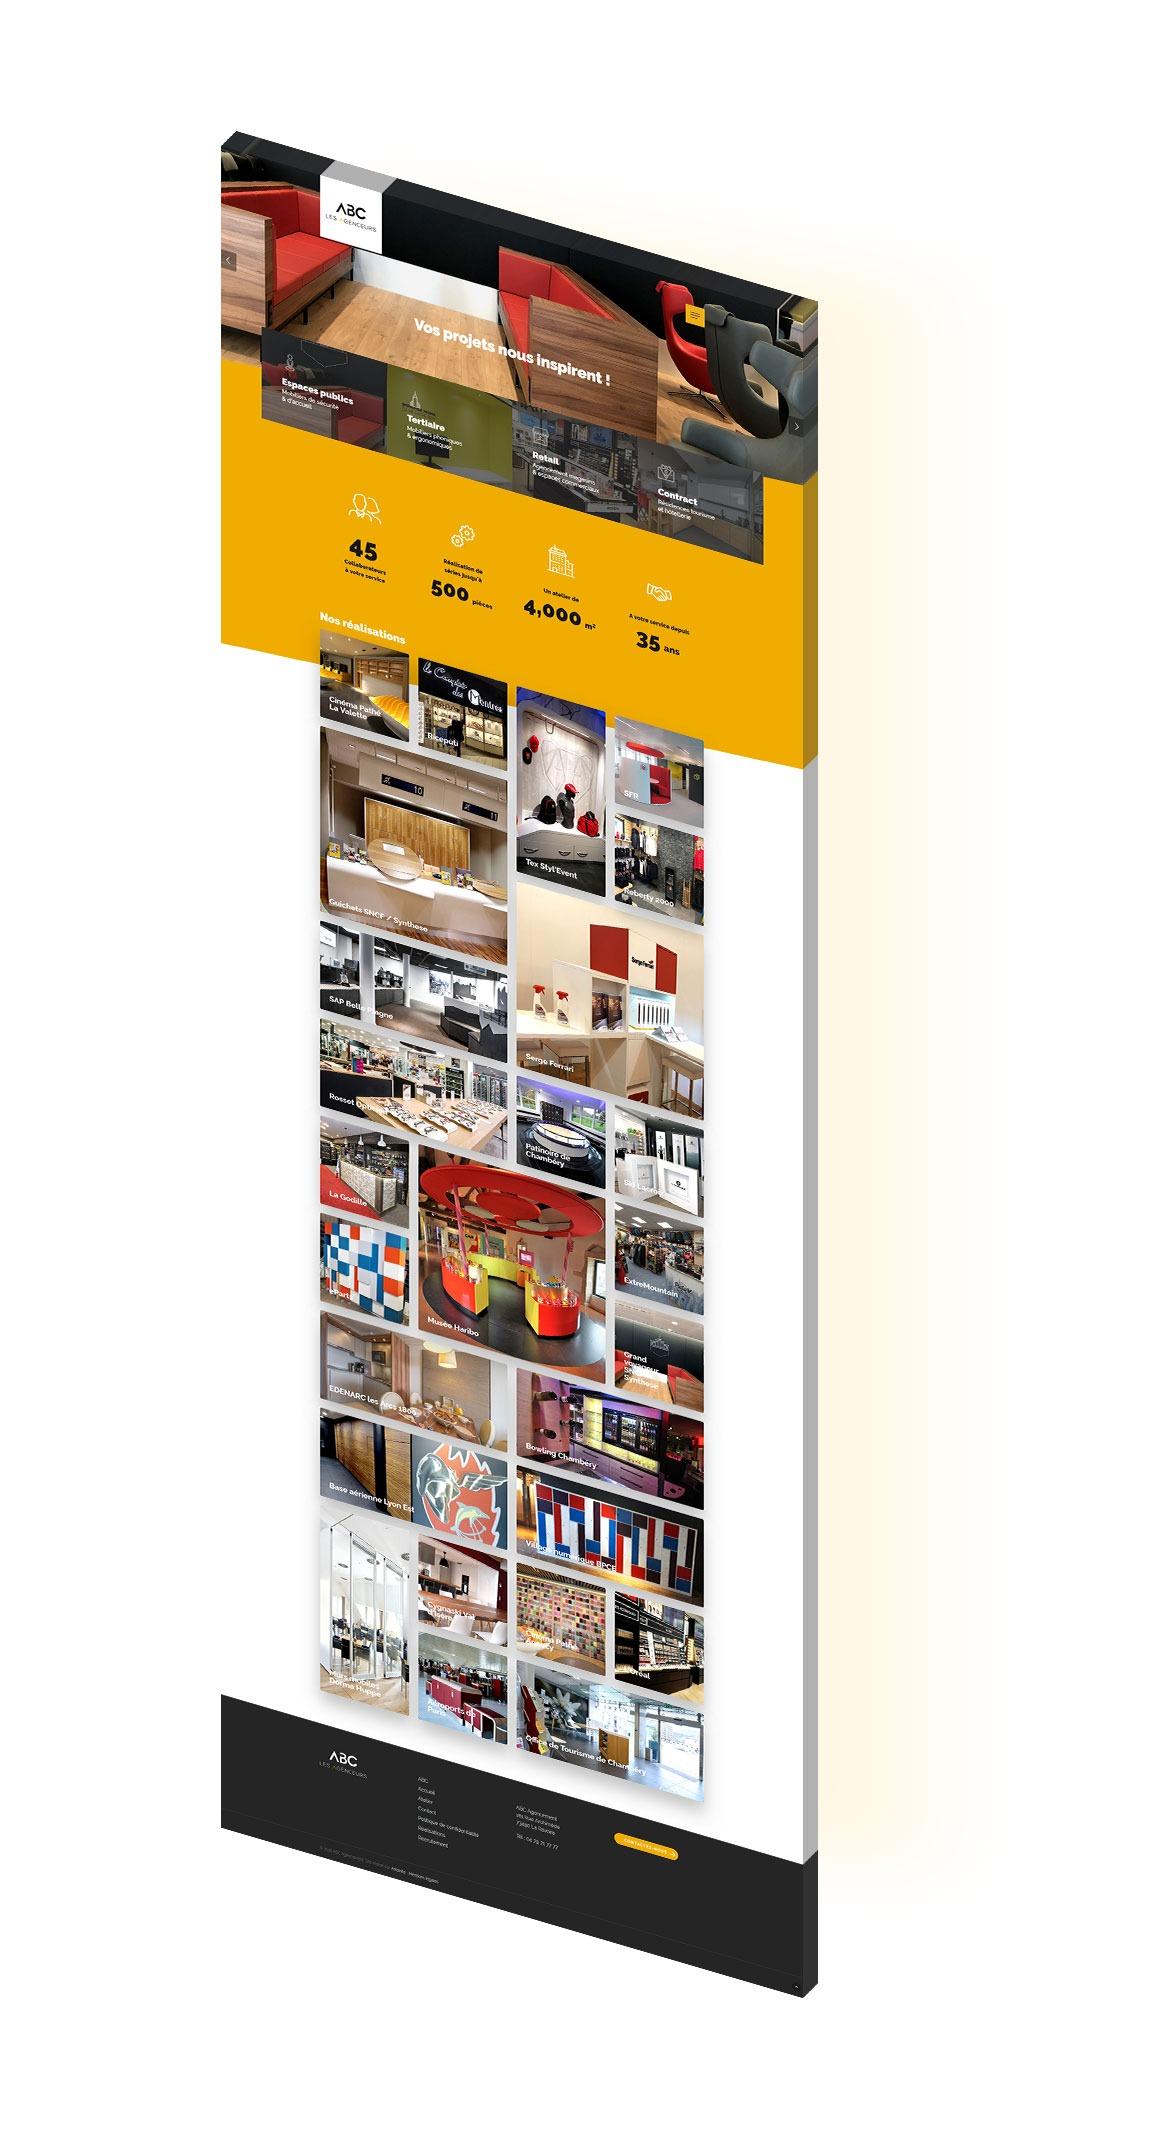 onepage isometric site wordpress agence web design developpement application mobile graphisme illustration logo lyon boutique en ligne ecommerce commerce internet